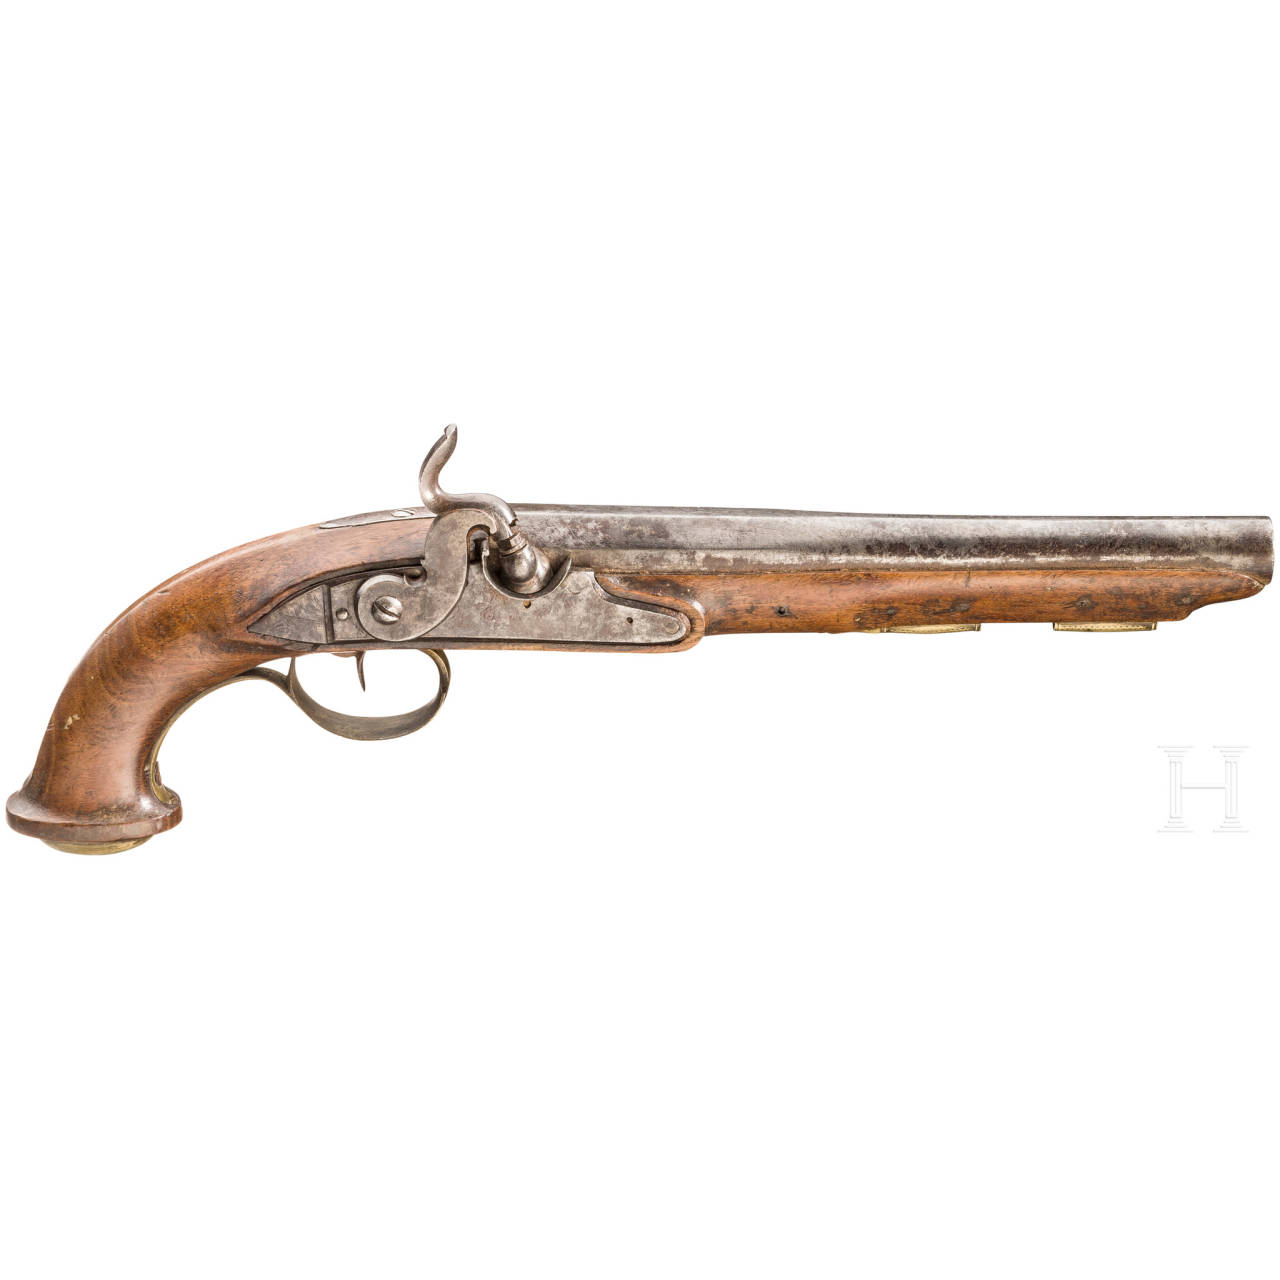 A percussion pistol, France, ca. 1800